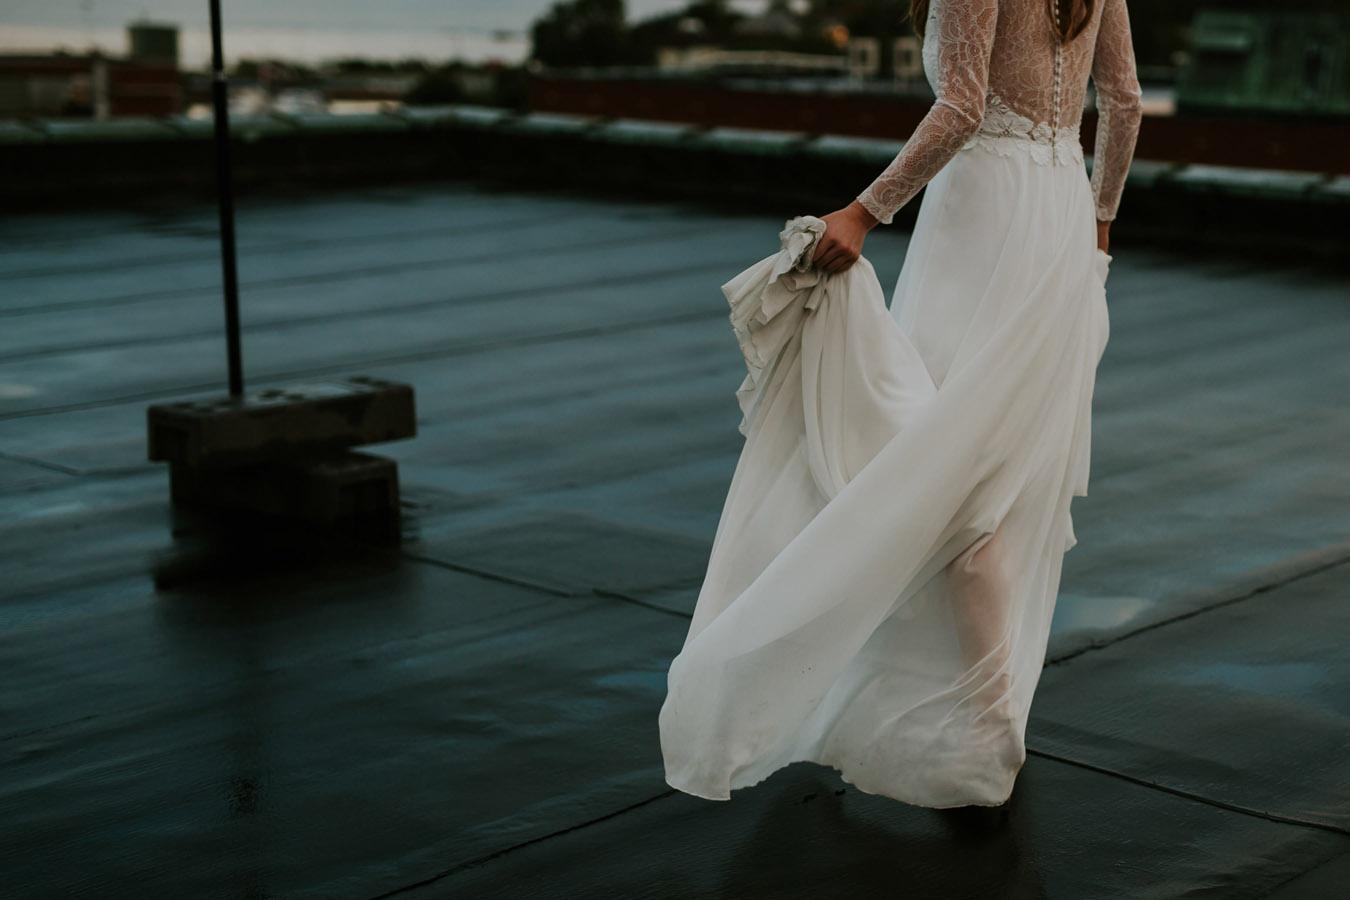 Fotograf-Tone-Tvedt-bryllup-102.jpg